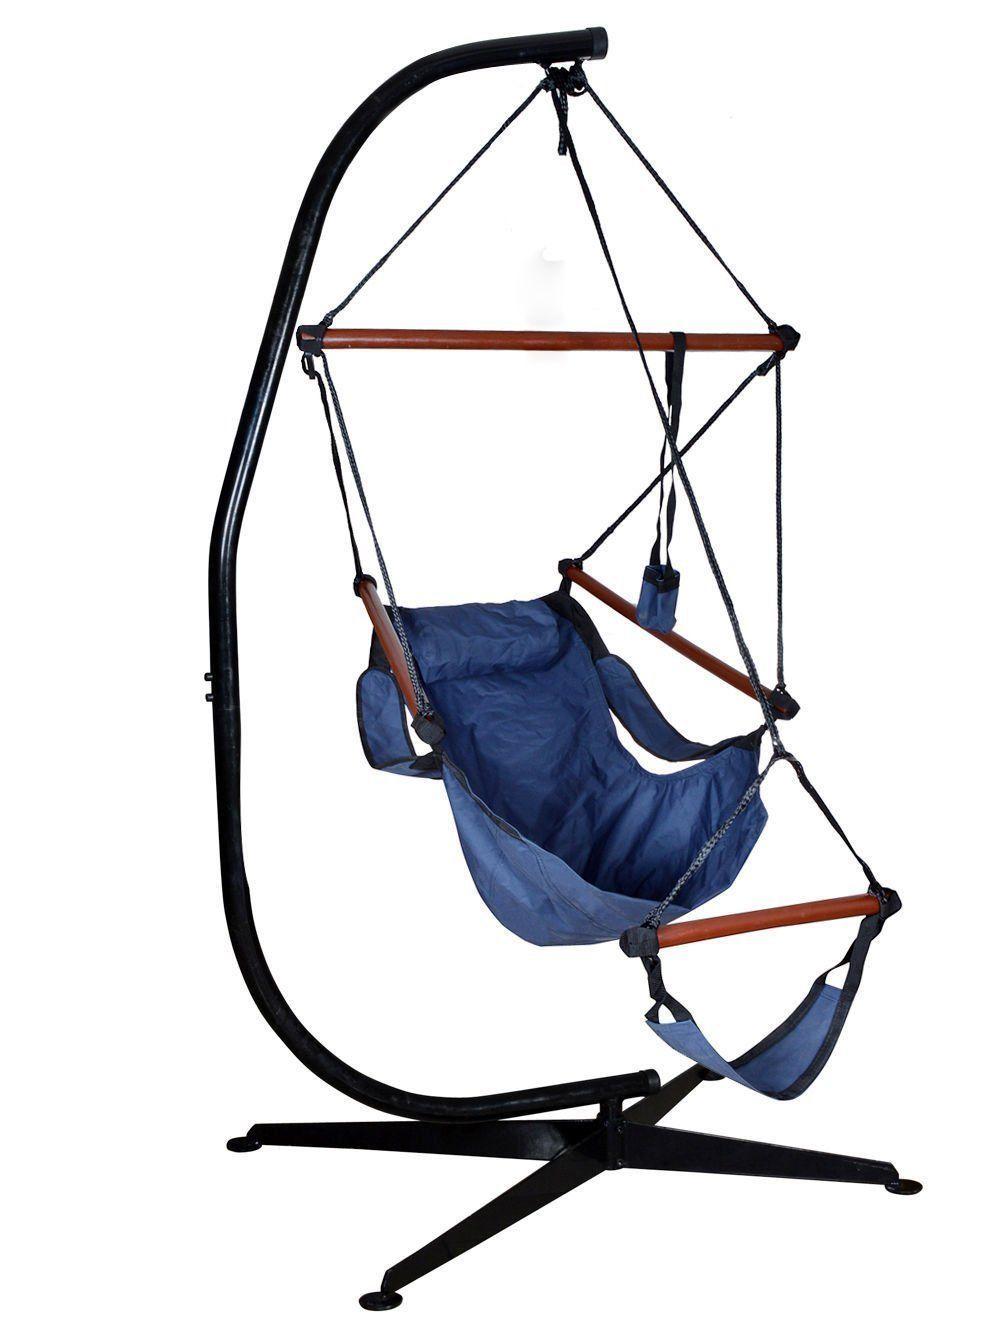 Algrenon Solid C Frame Metal Hammock Chair Stand | Hammock chair ...